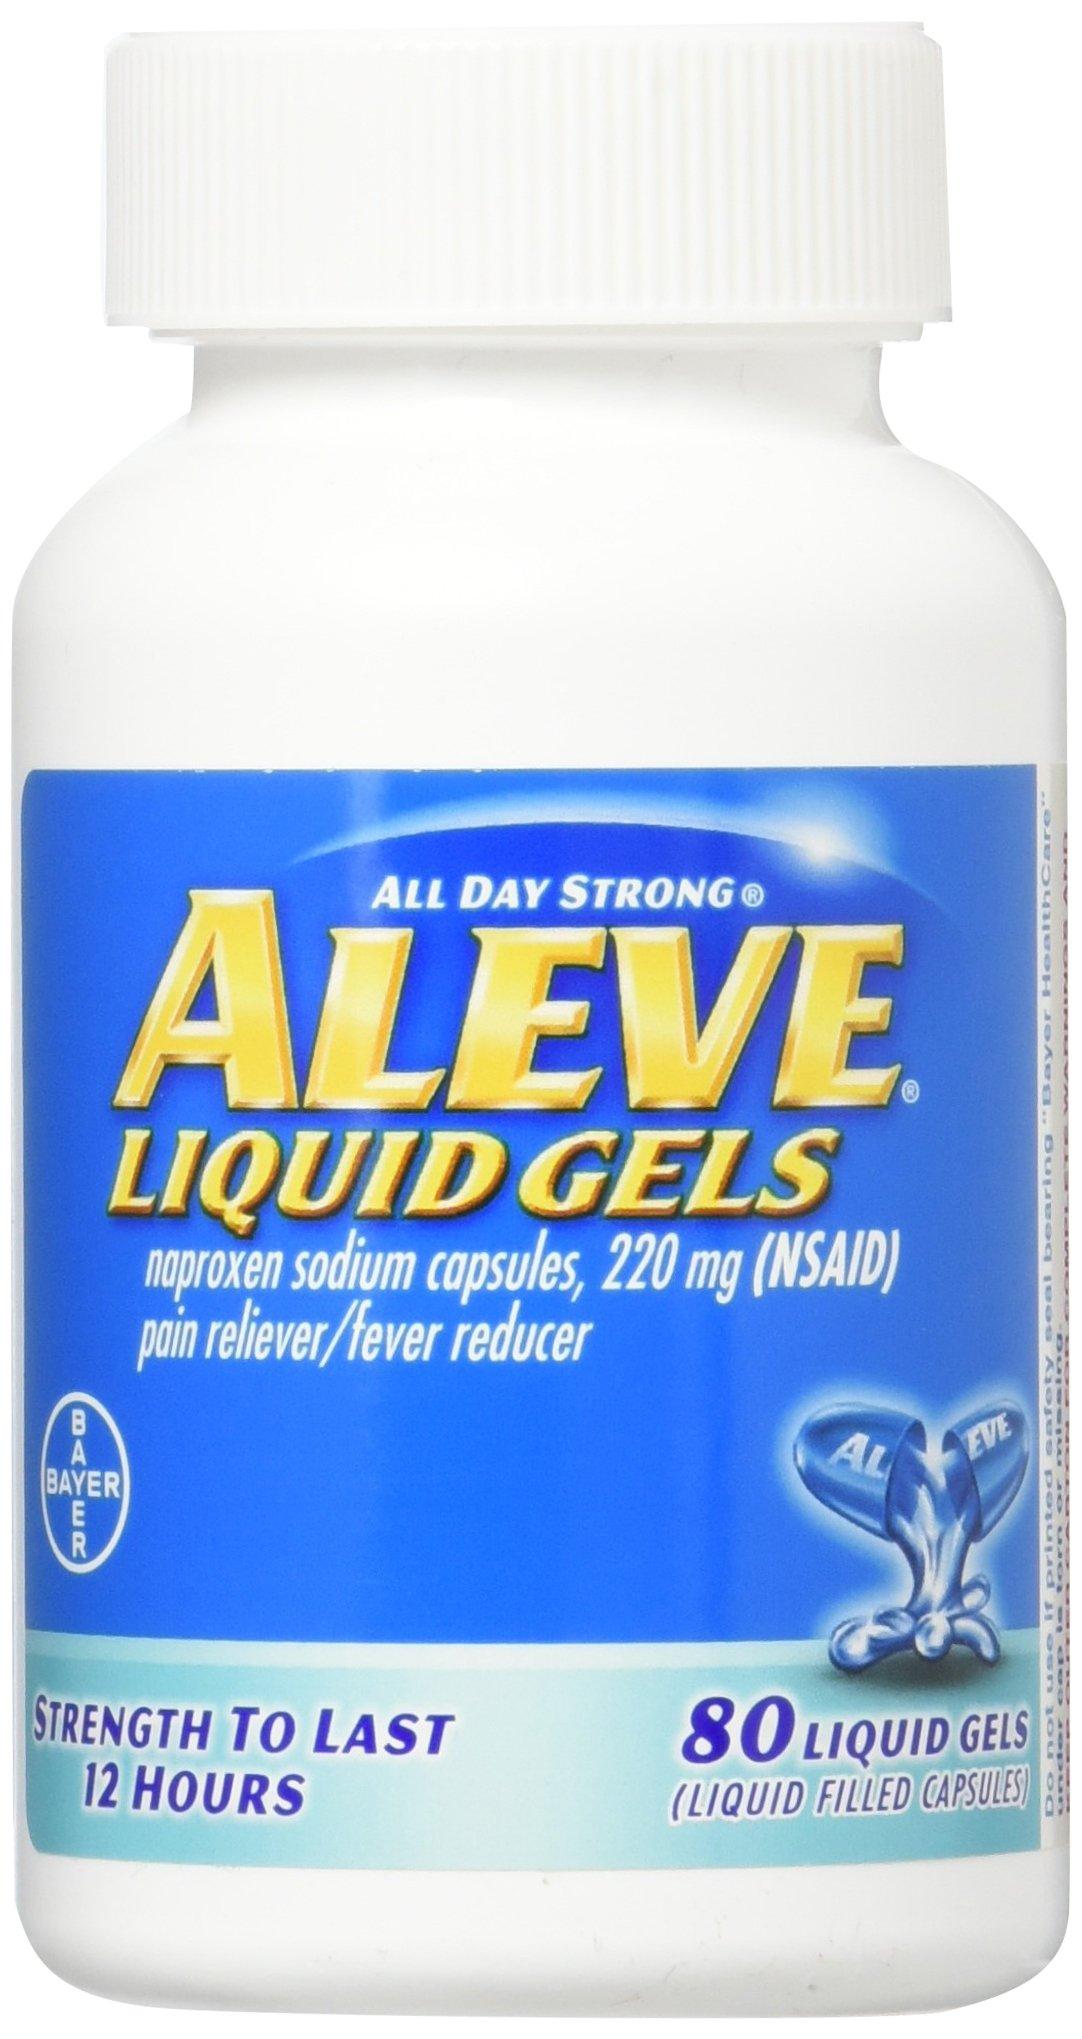 Aleve Liquid Gels, 80 ct